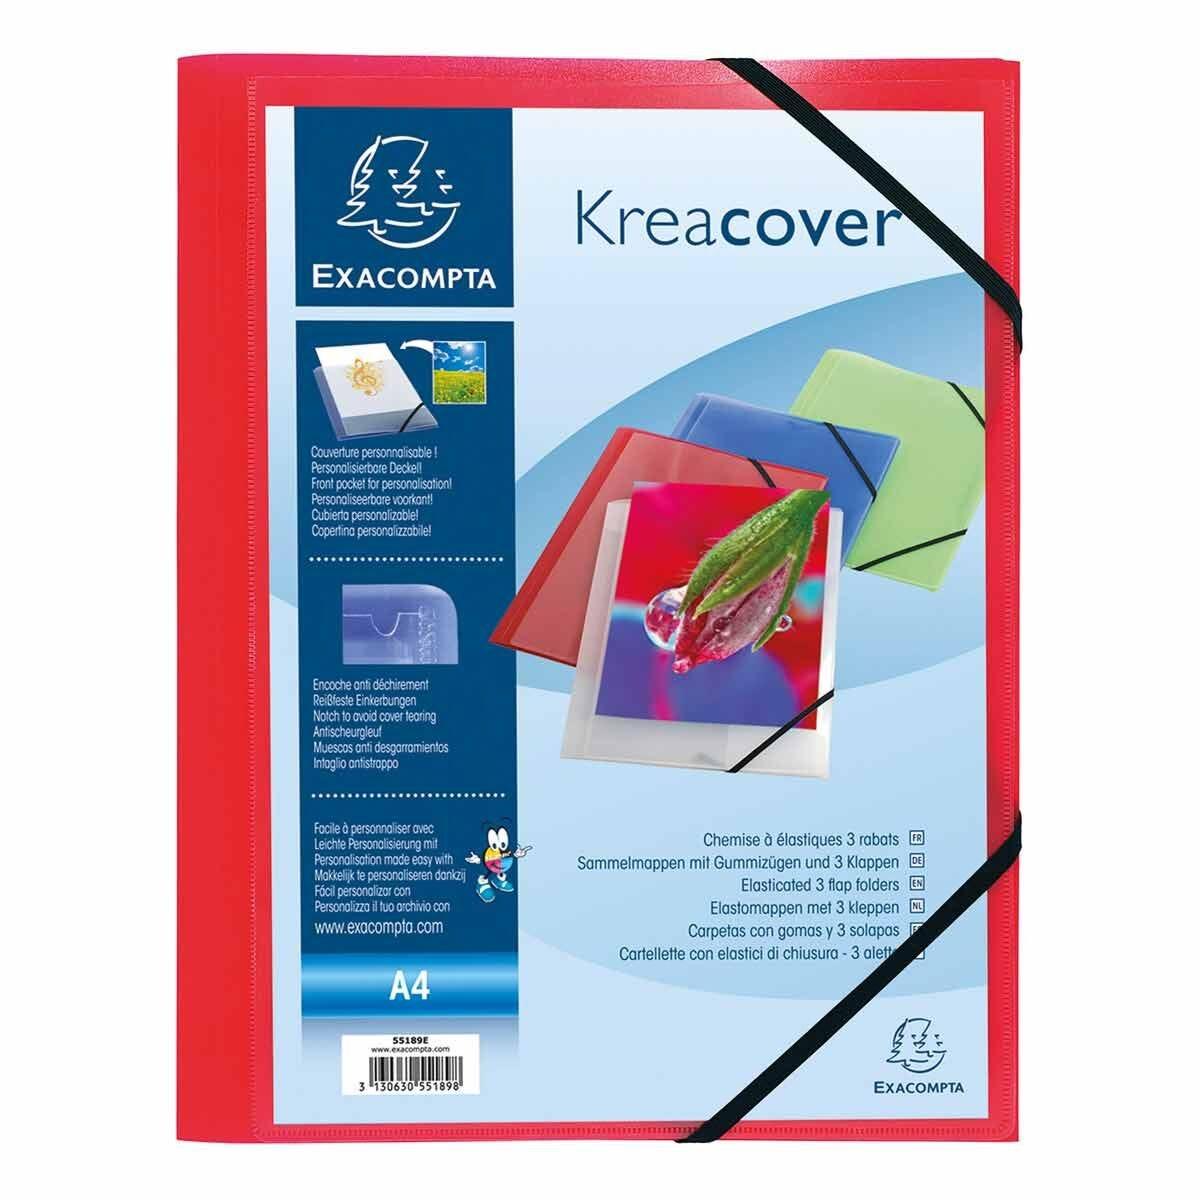 Exacompta Kreacover Elasticated 3 Flap Folder A4 Pack of 25